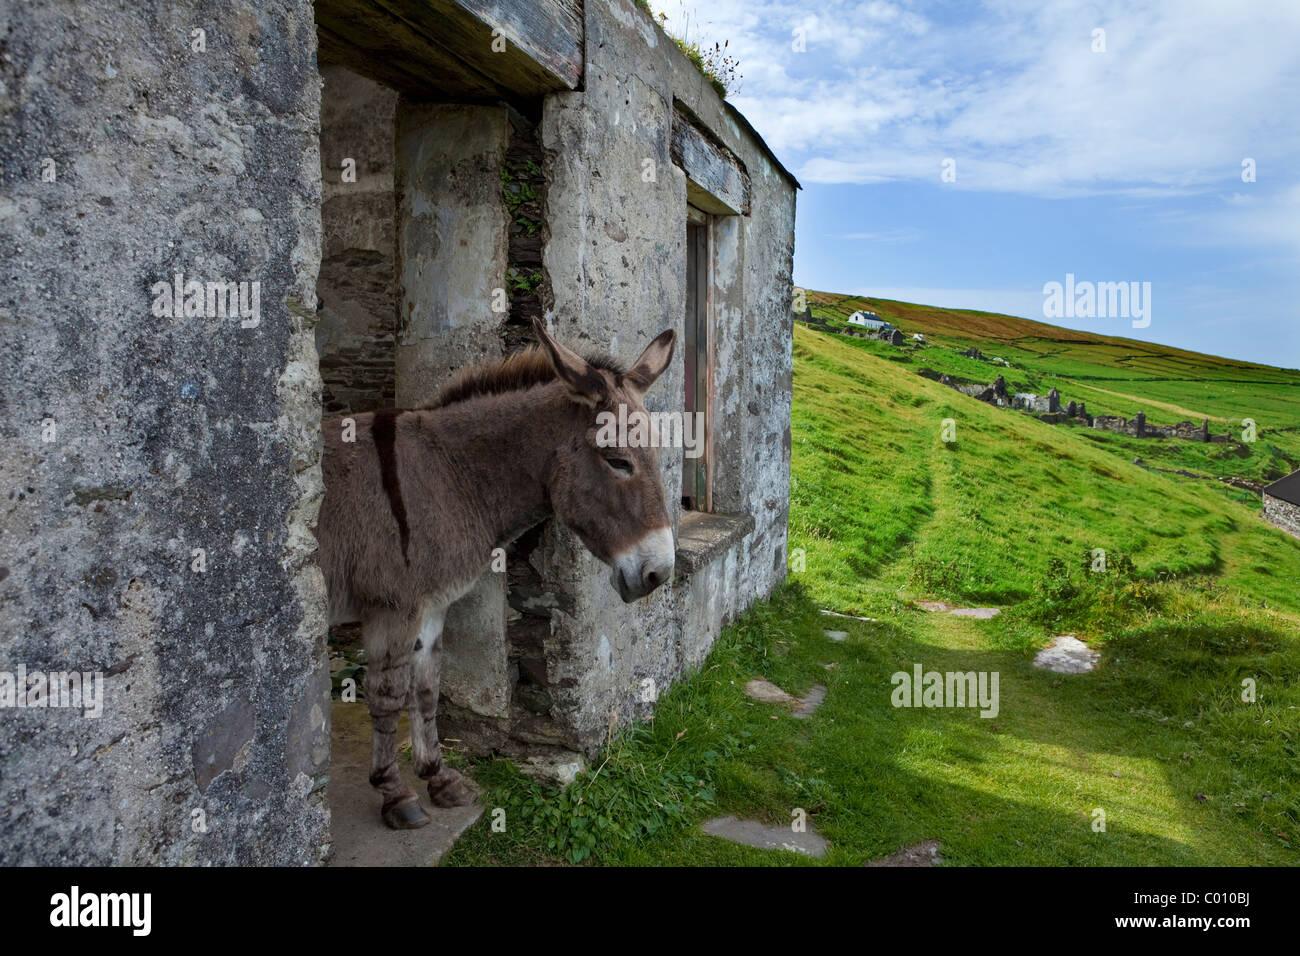 Donkey in Deserted Evacuated Cottages on Great Blasket Island, The Blasket Islands, Off the Dingle Peninsula, County - Stock Image